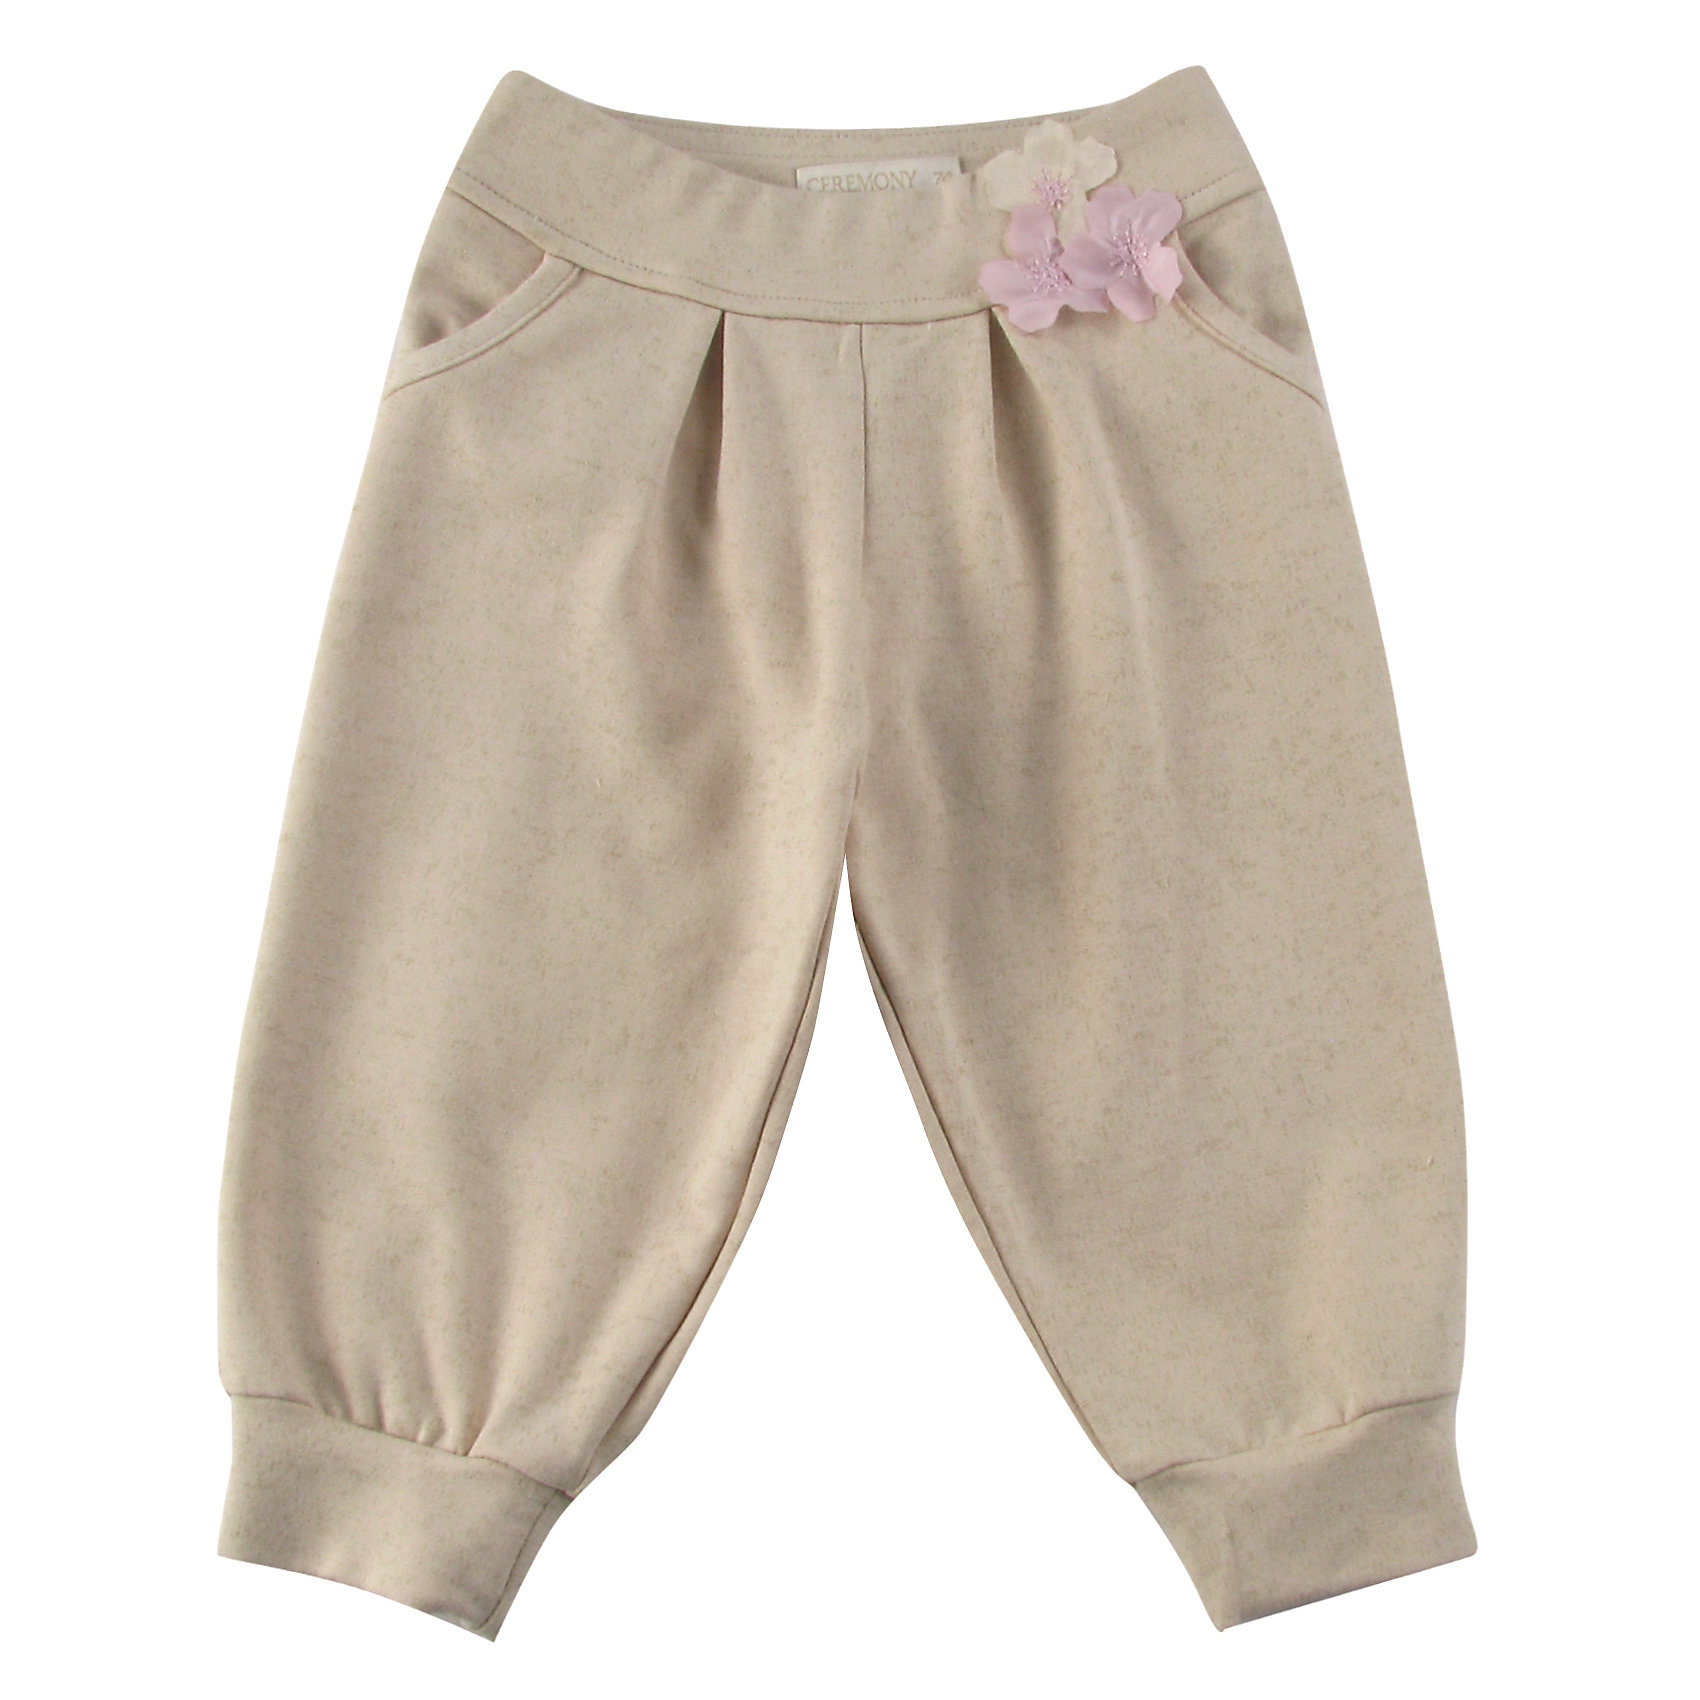 Спортивные штаны для девочки WojcikДжинсы и брючки<br>Спортивные штаны для девочки Wojcik<br>Состав:<br>Хлопок 97% Эластан 3%<br><br>Ширина мм: 215<br>Глубина мм: 88<br>Высота мм: 191<br>Вес г: 336<br>Цвет: бежевый<br>Возраст от месяцев: 3<br>Возраст до месяцев: 6<br>Пол: Женский<br>Возраст: Детский<br>Размер: 68,98,74,80,86,92<br>SKU: 5589996